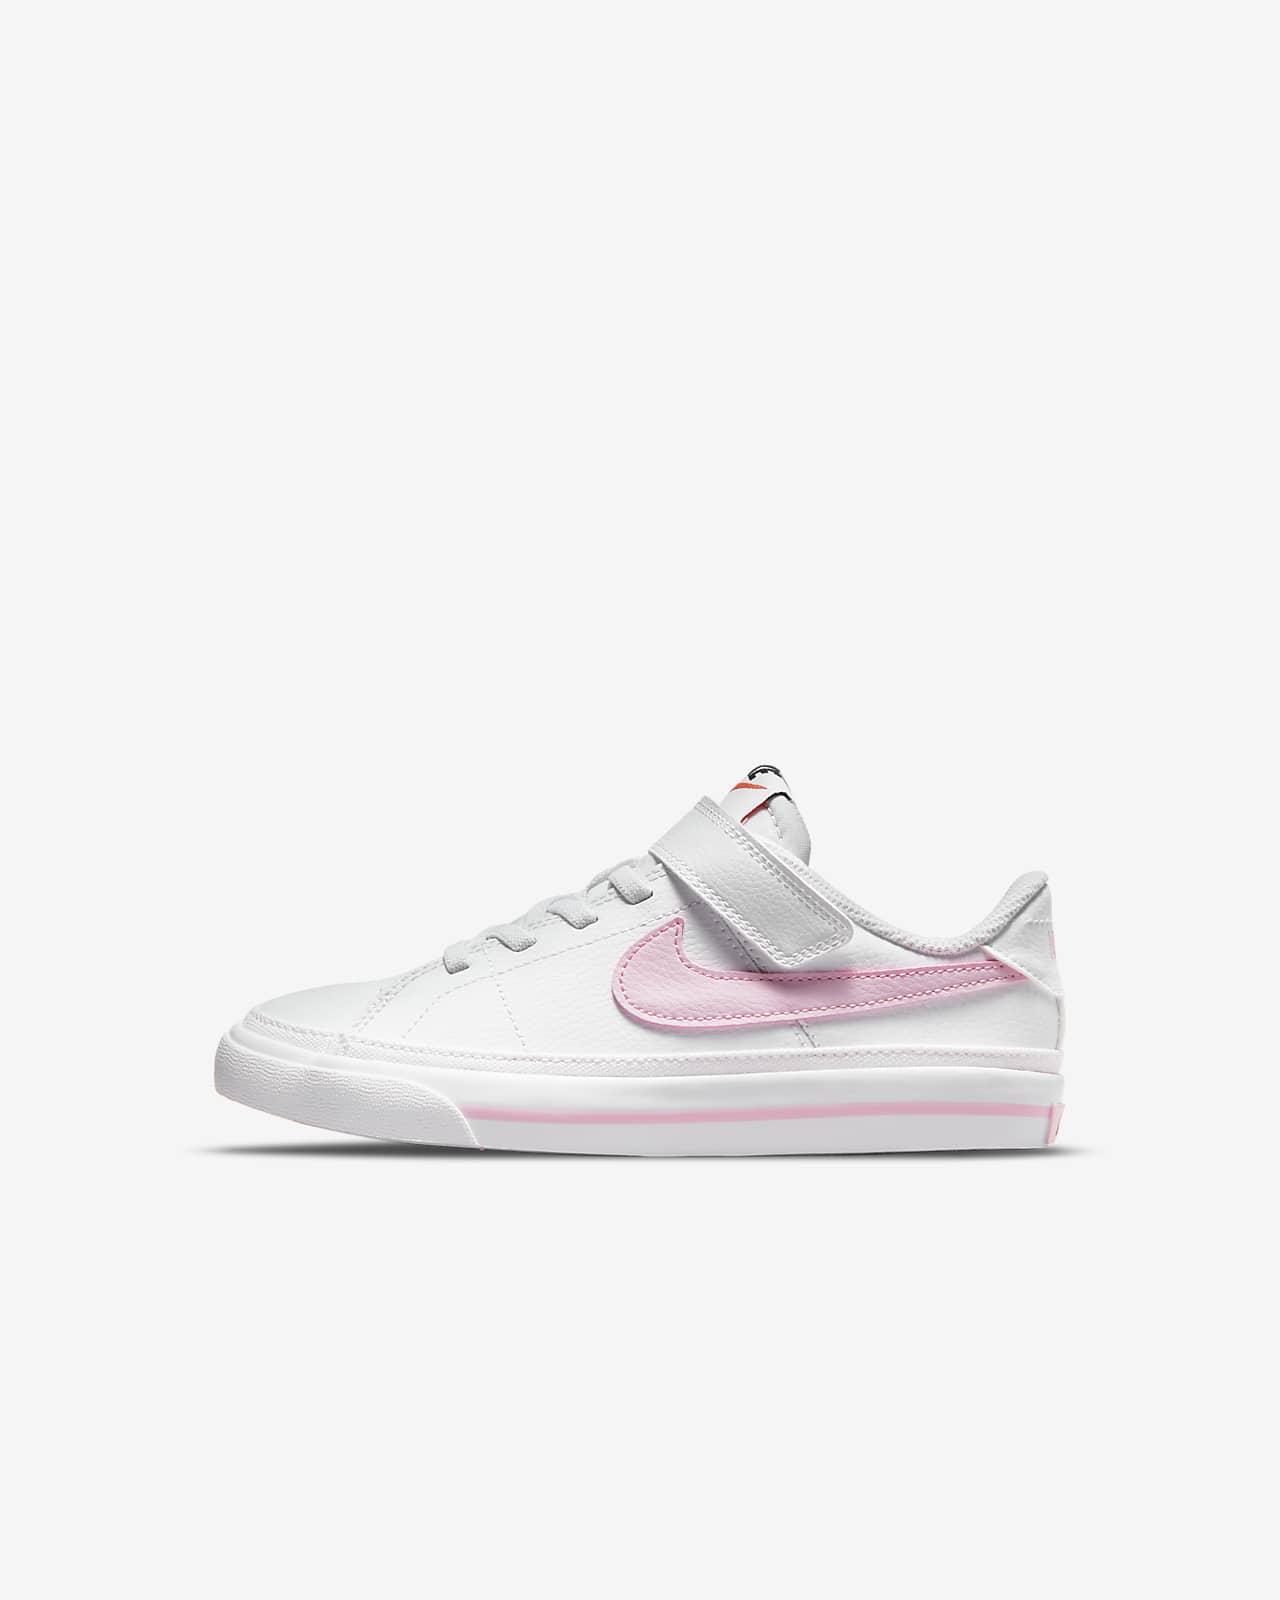 Sko Nike Court Legacy för barn